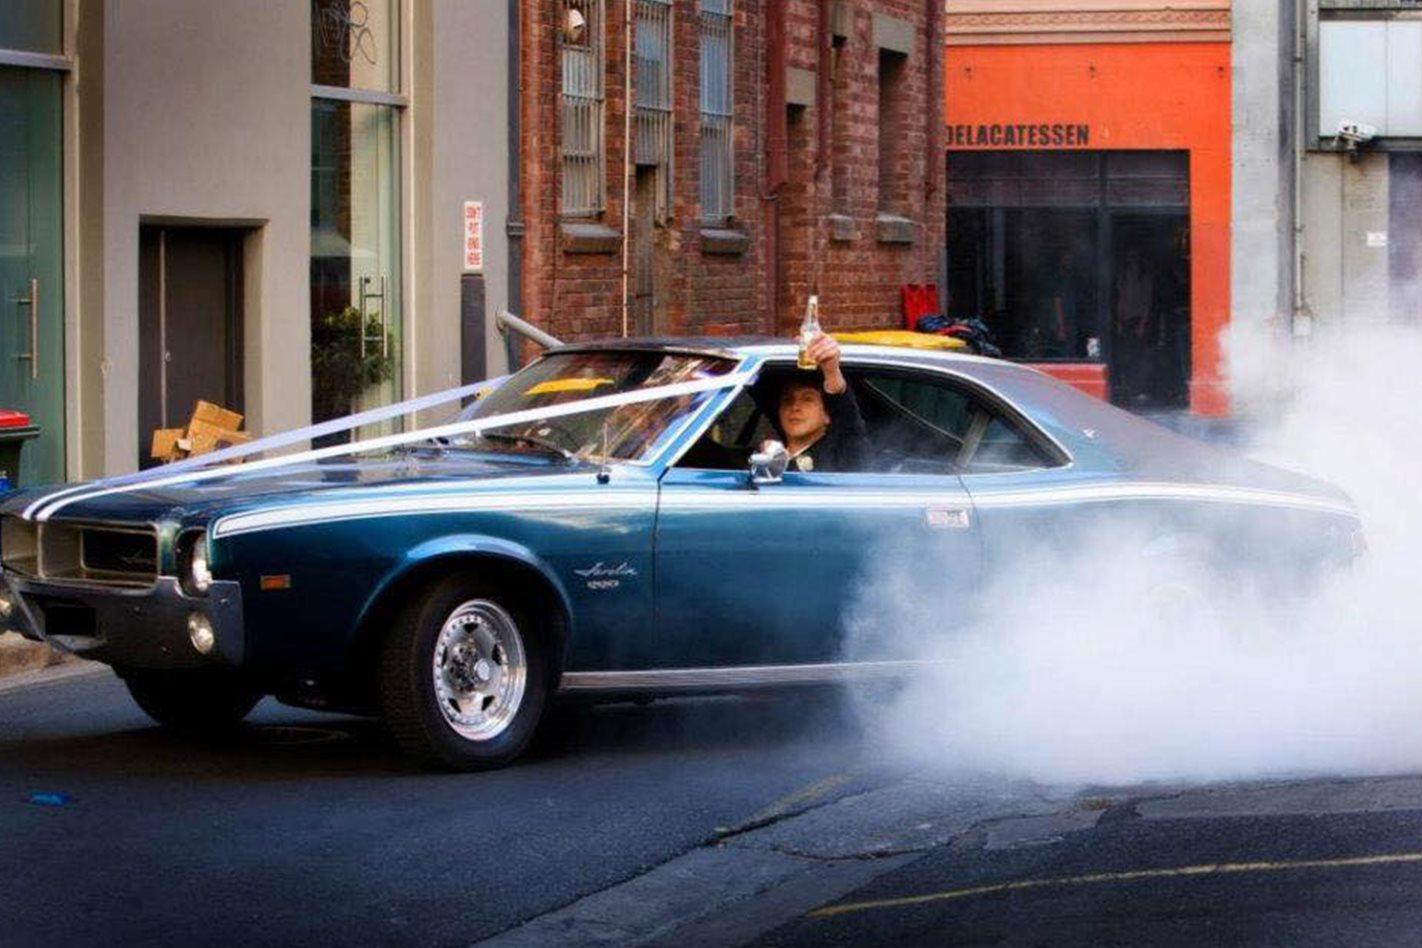 Adam Ciplys's wedding car